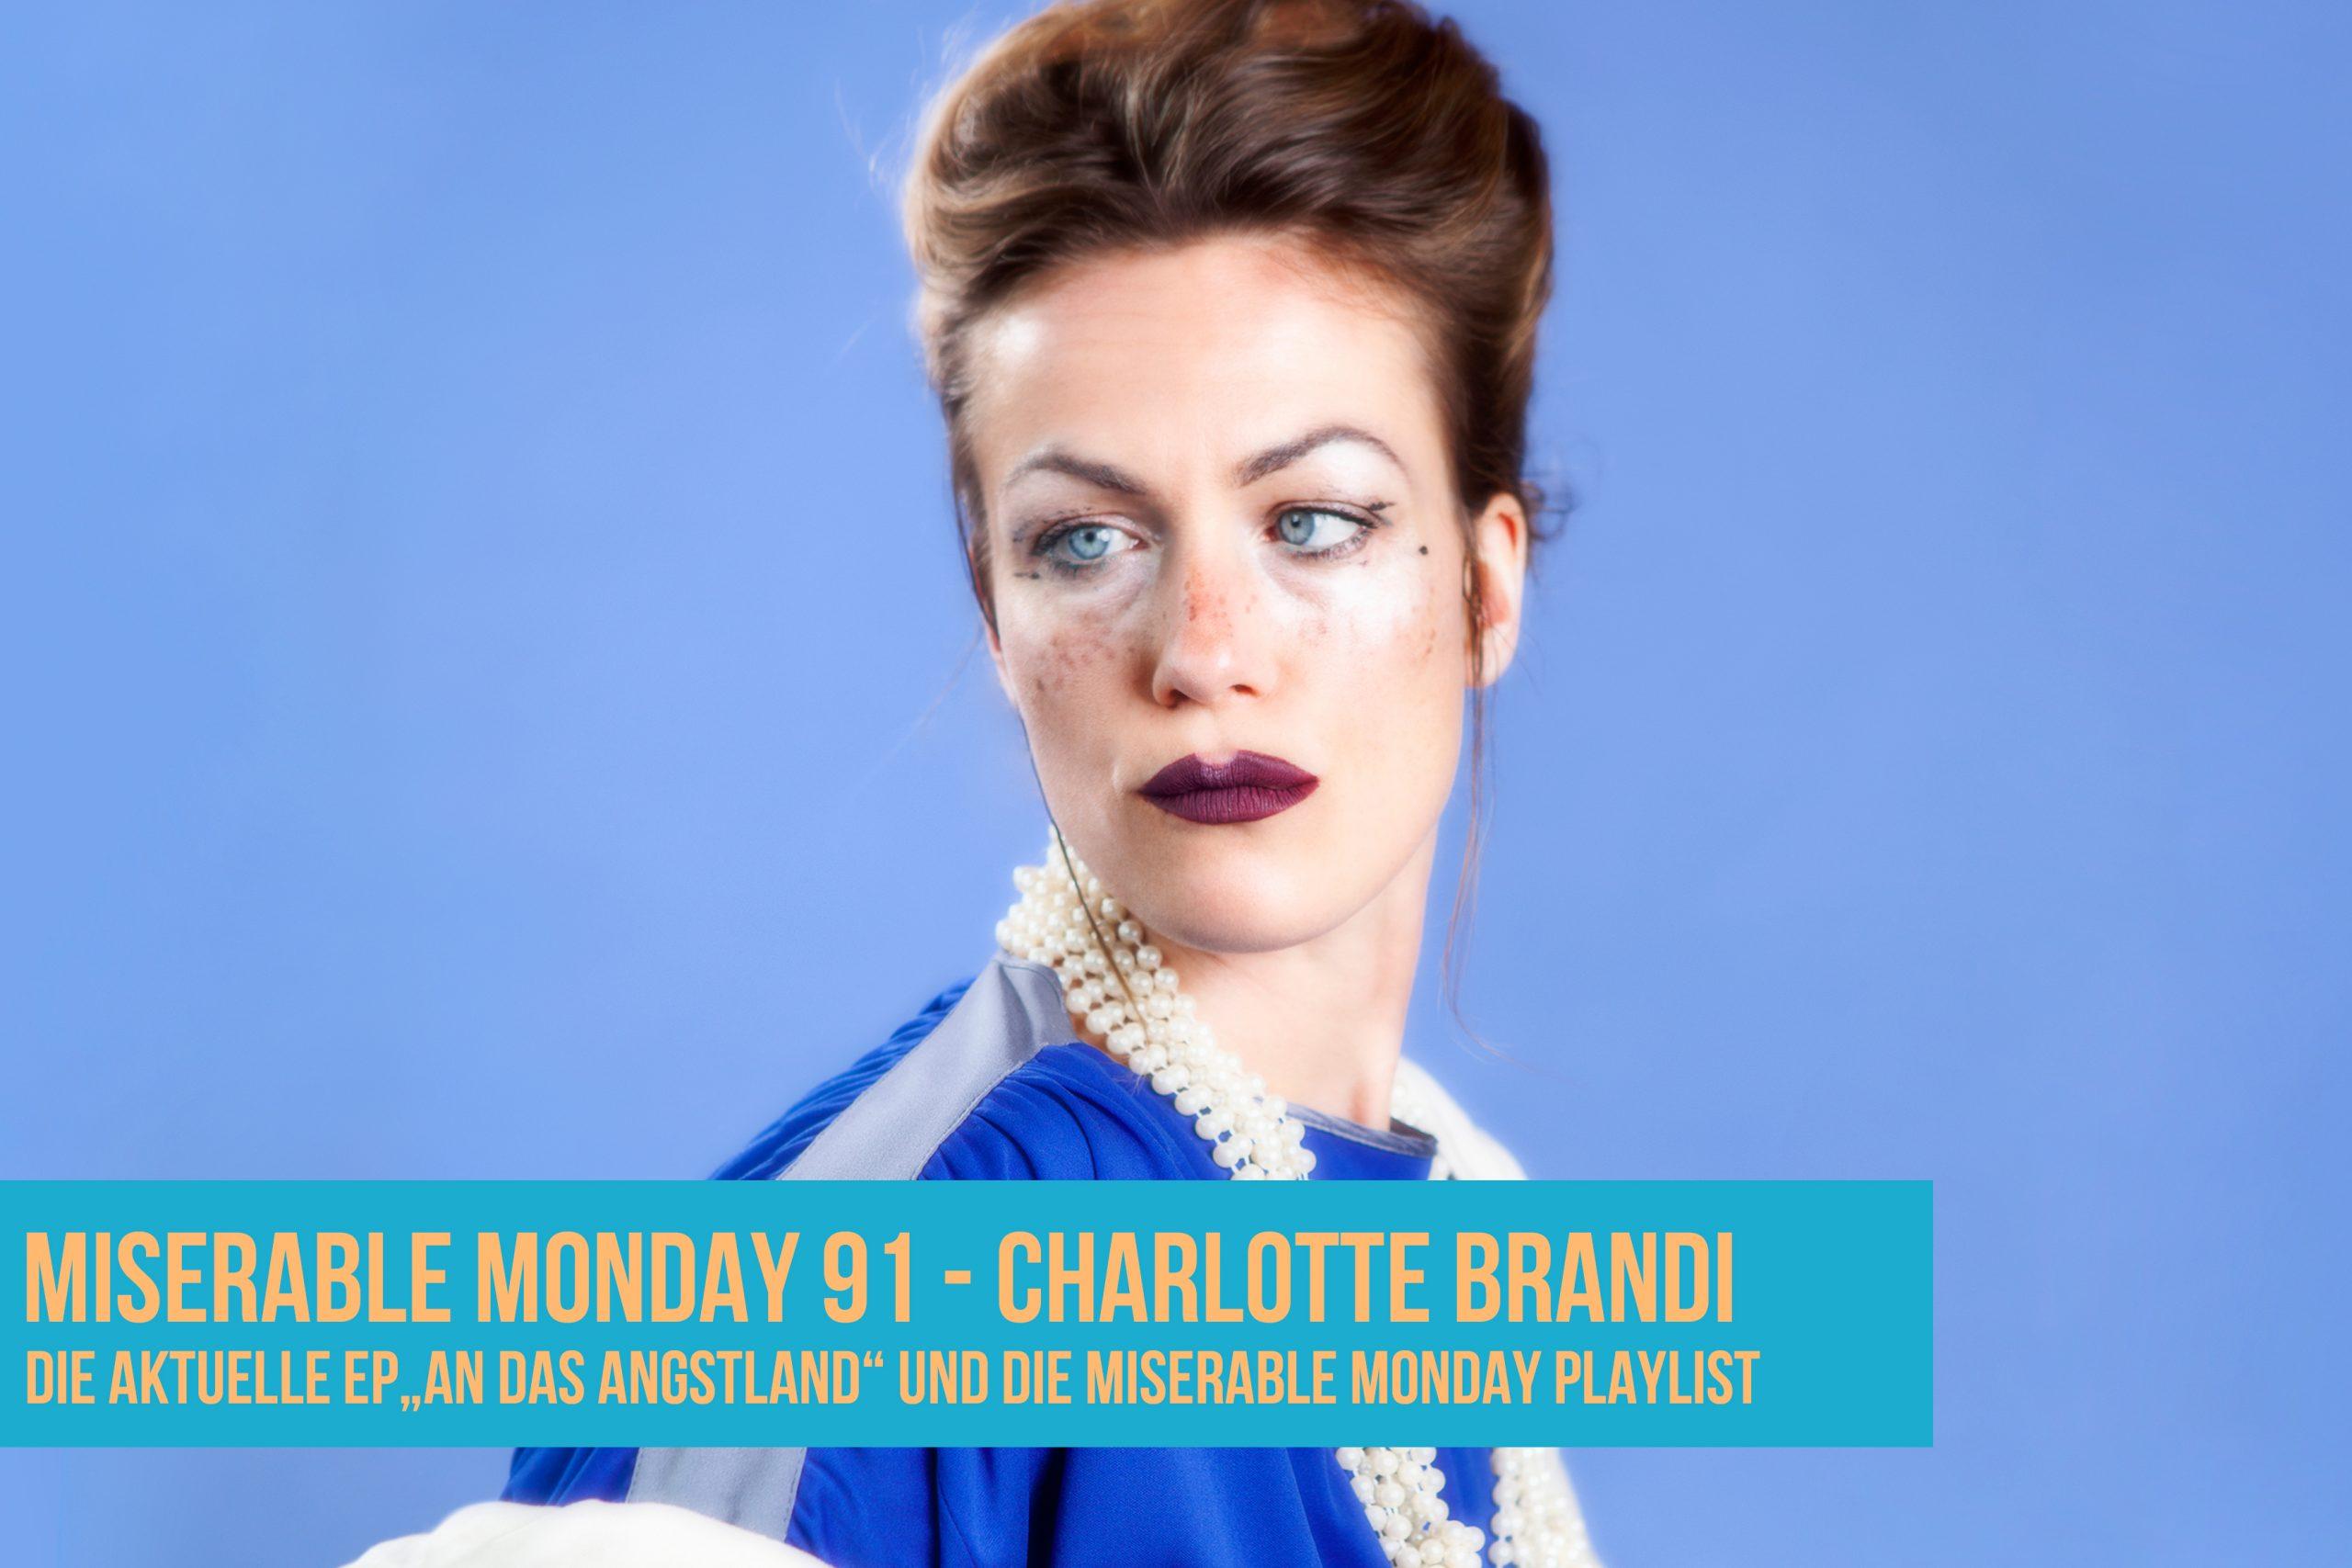 91 - Charlotte Brandi